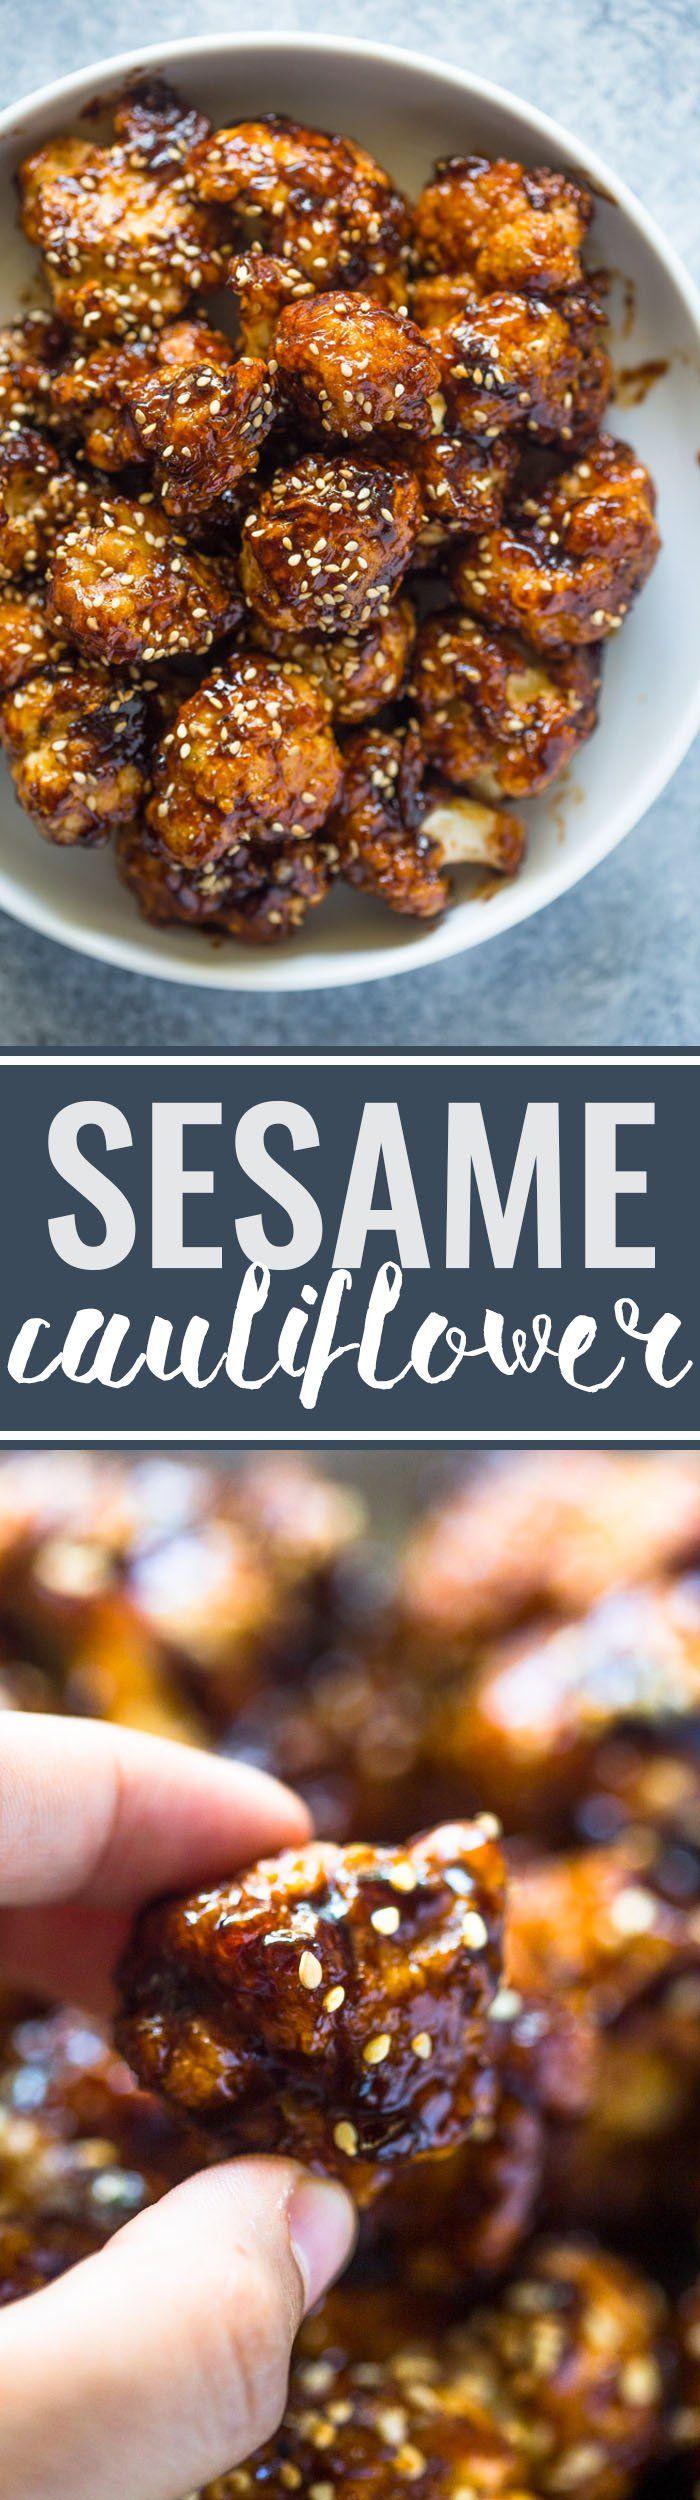 Crispy Sesame Cauliflower Bites                                                                                                                                                                                 More